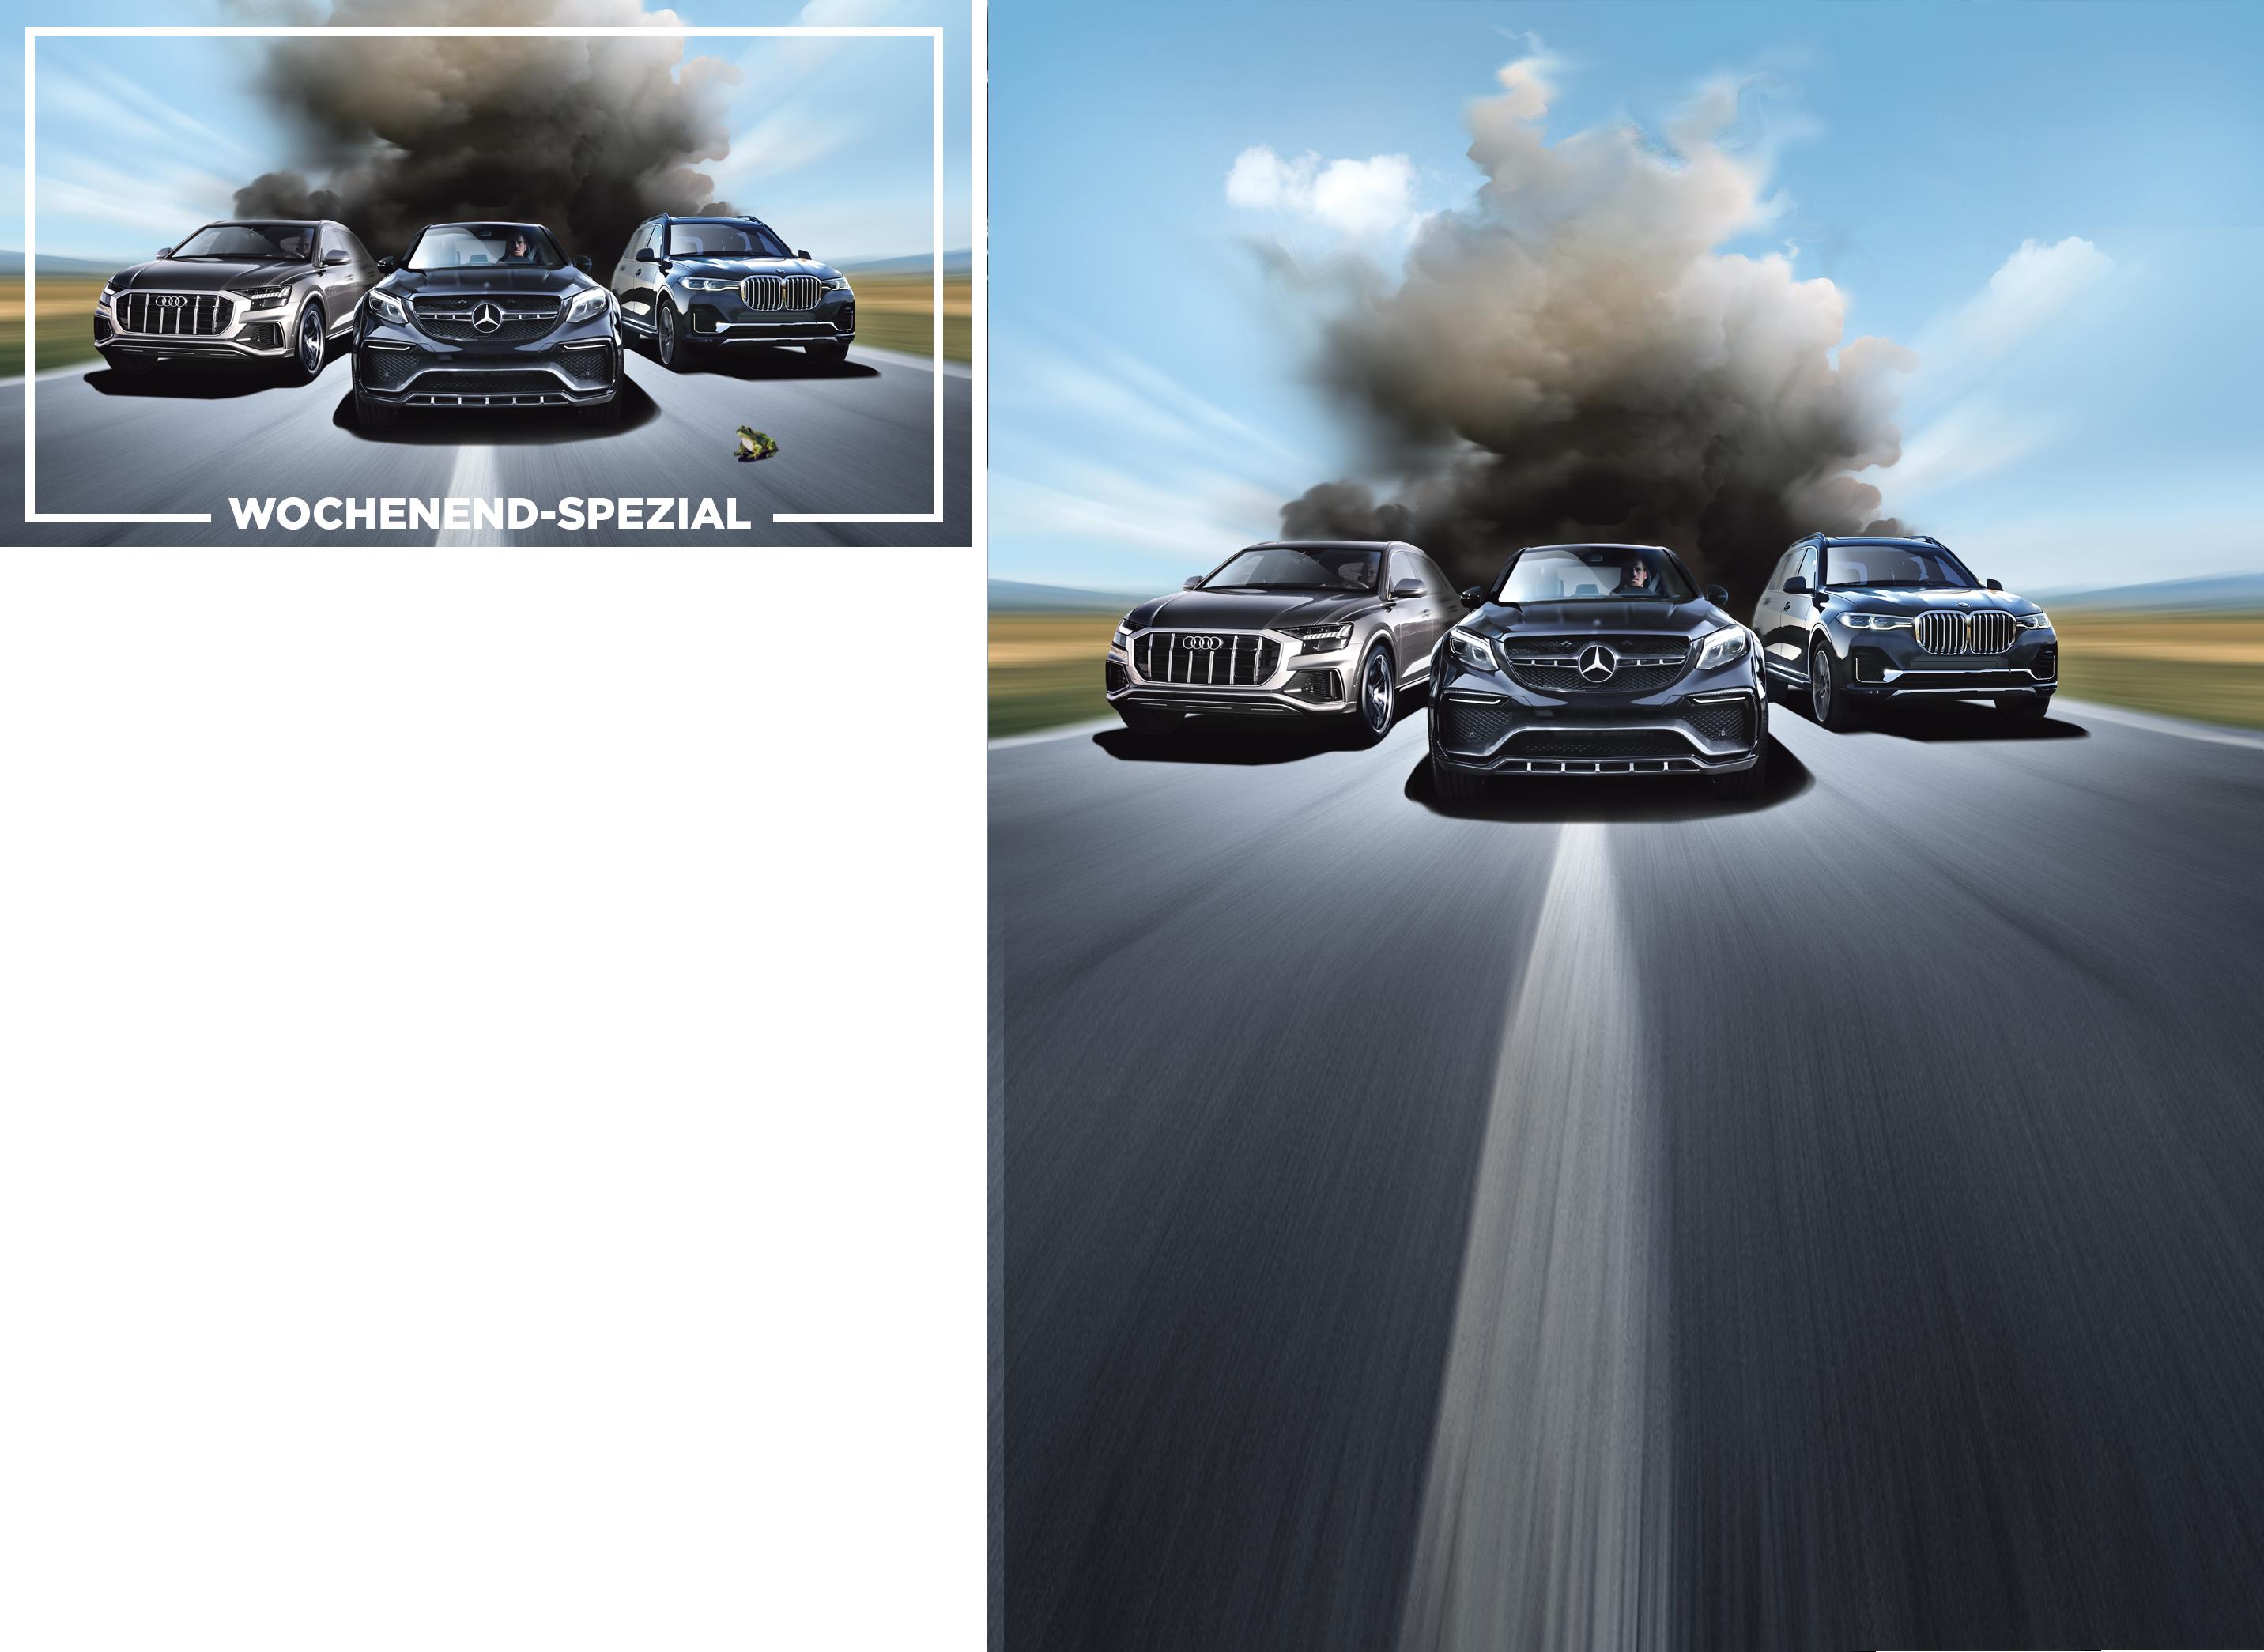 BMW, Daimler, VW, Audi: Der SUV-Wahnsinn